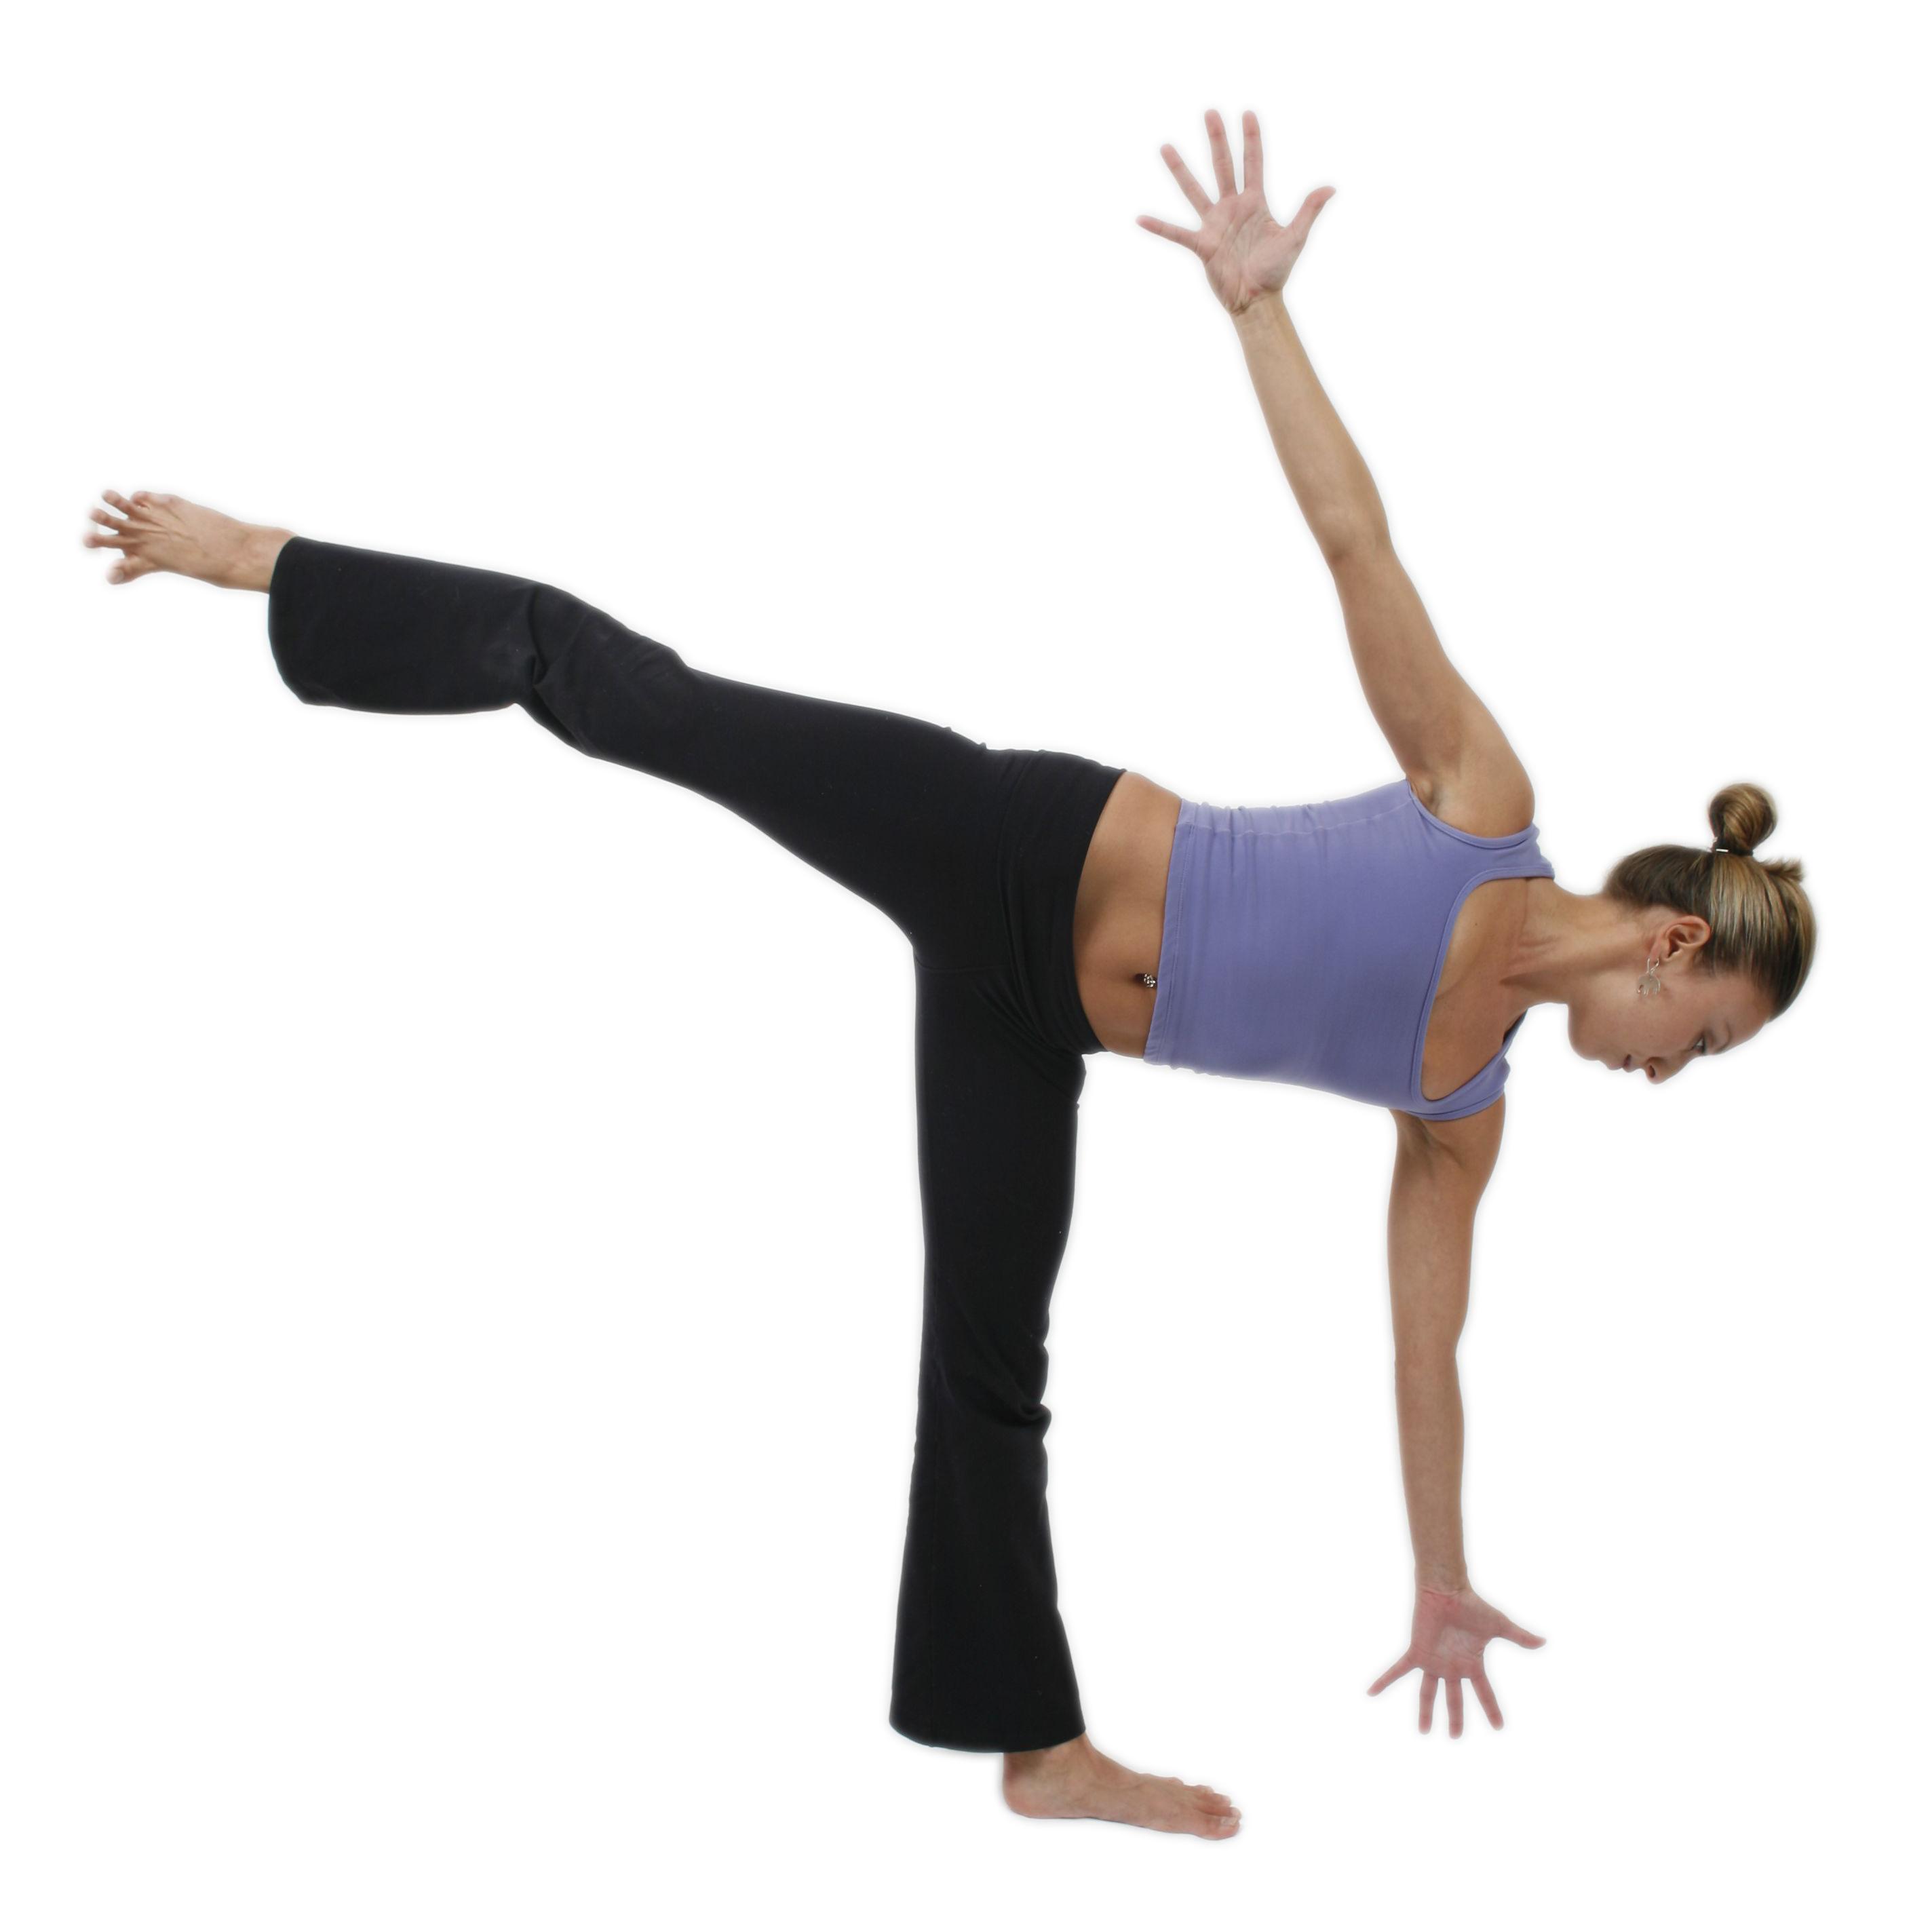 Yoga Poses For Beginners Chart Half Moon Pose - Pose ...